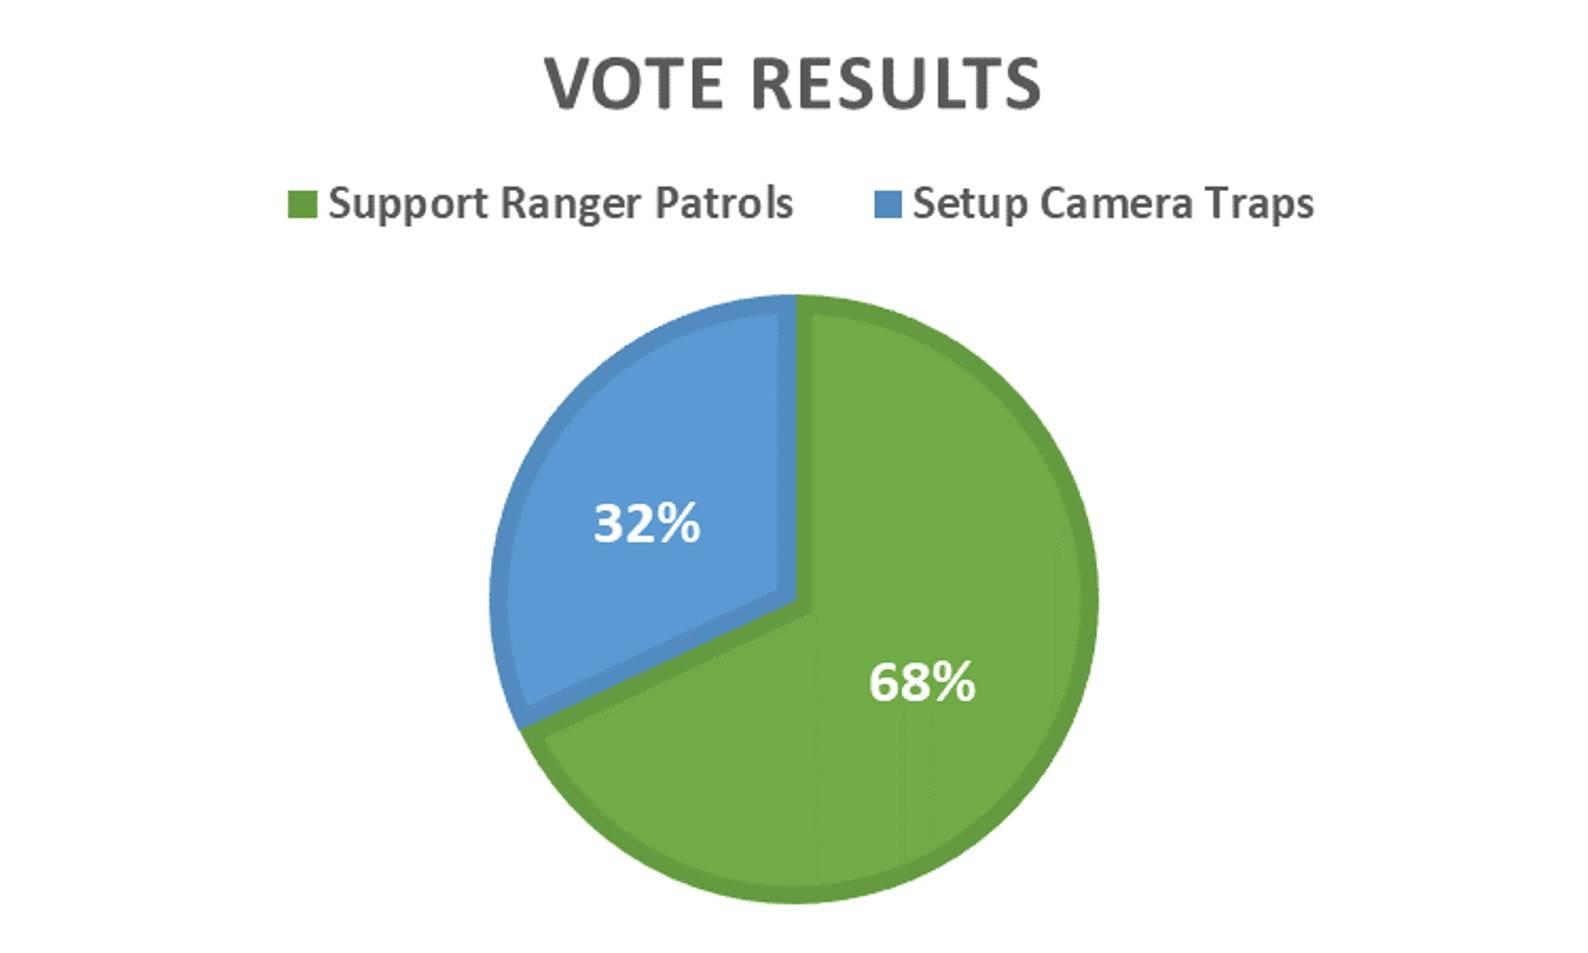 Rewilding vote results displayed in a pie chart